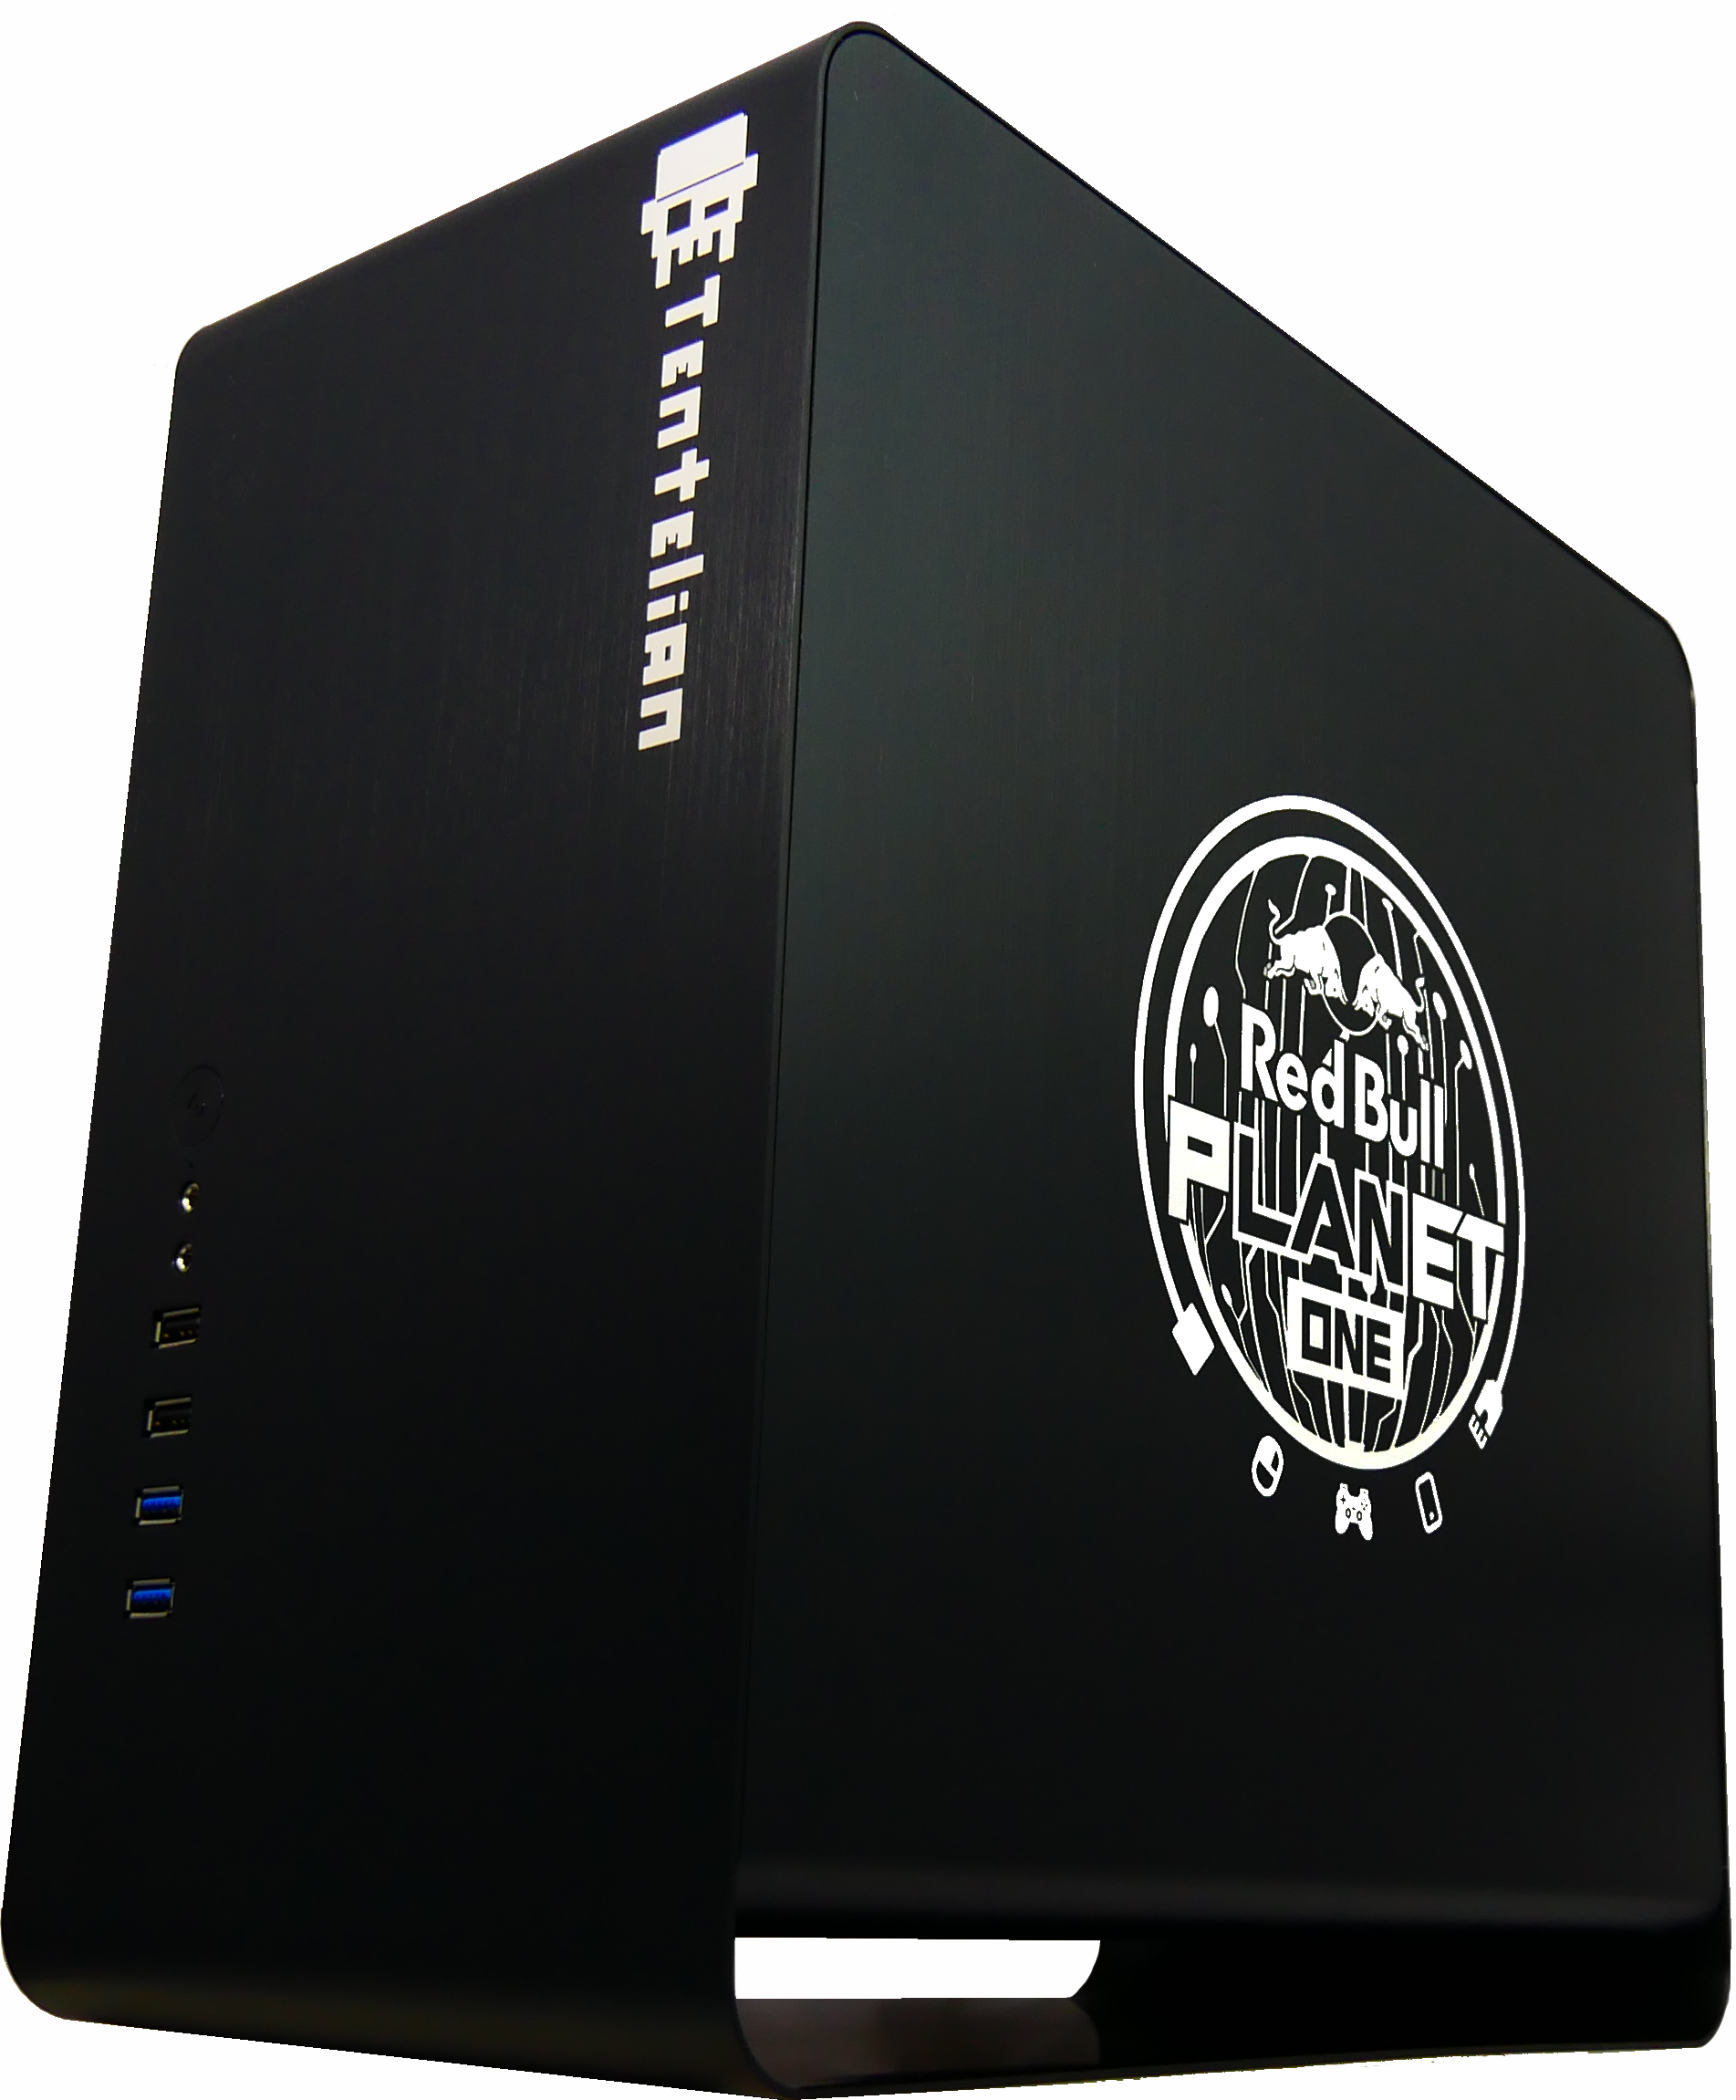 Tenetelian Red Bull pLANet One Edition